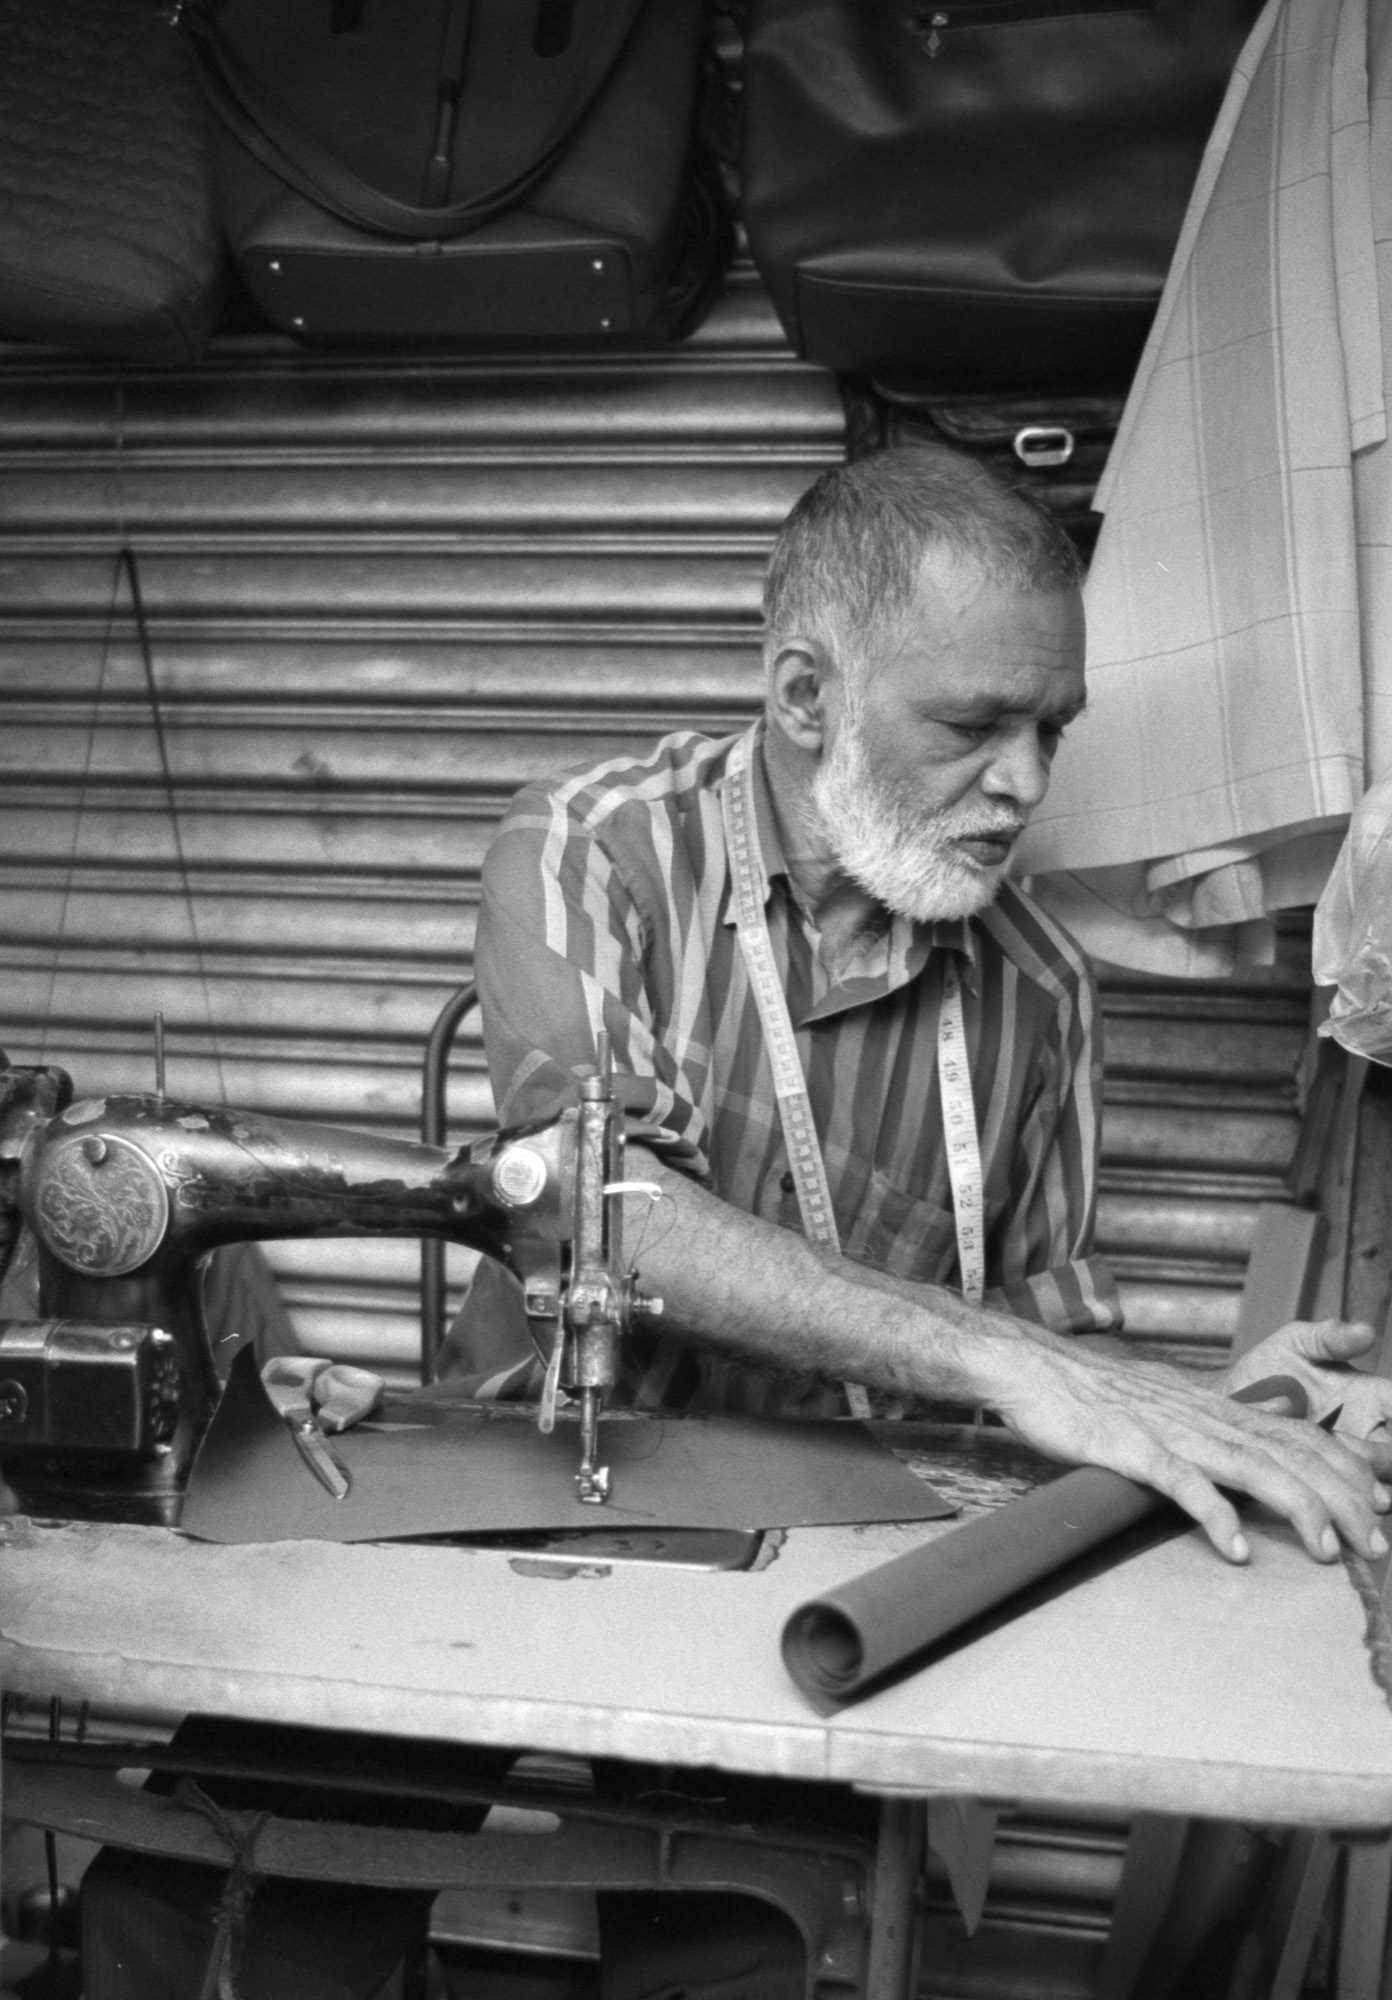 Handmade - Kandy, Sri Lanka - lIford HP5 EI400 Nikon FM3A